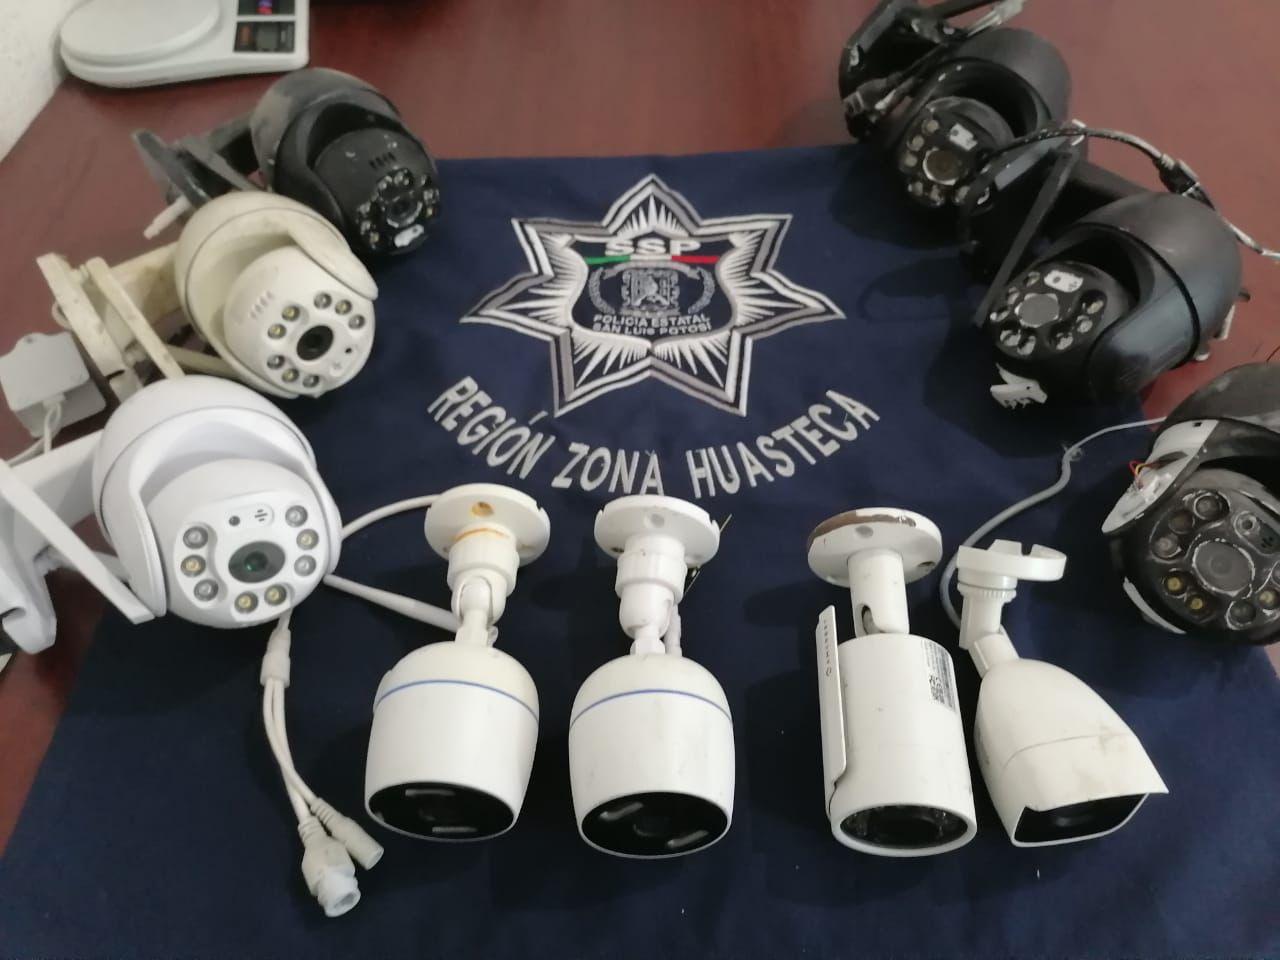 desmantelan centro de vigilancia en Valles